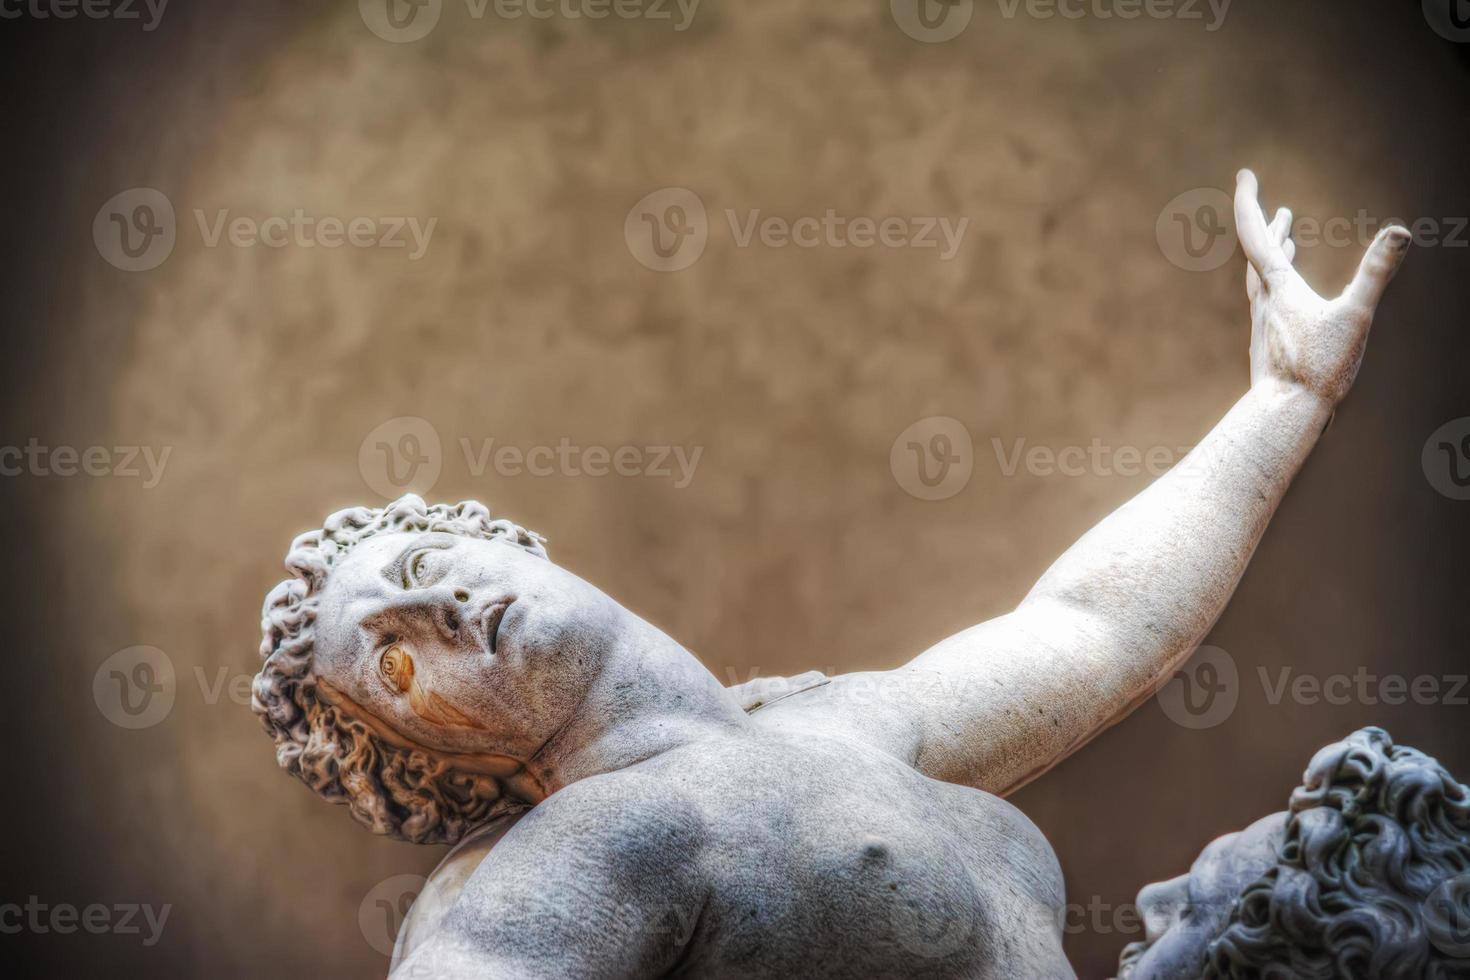 Ratto delle sabine statue dans la loggia de lanzi à florence photo